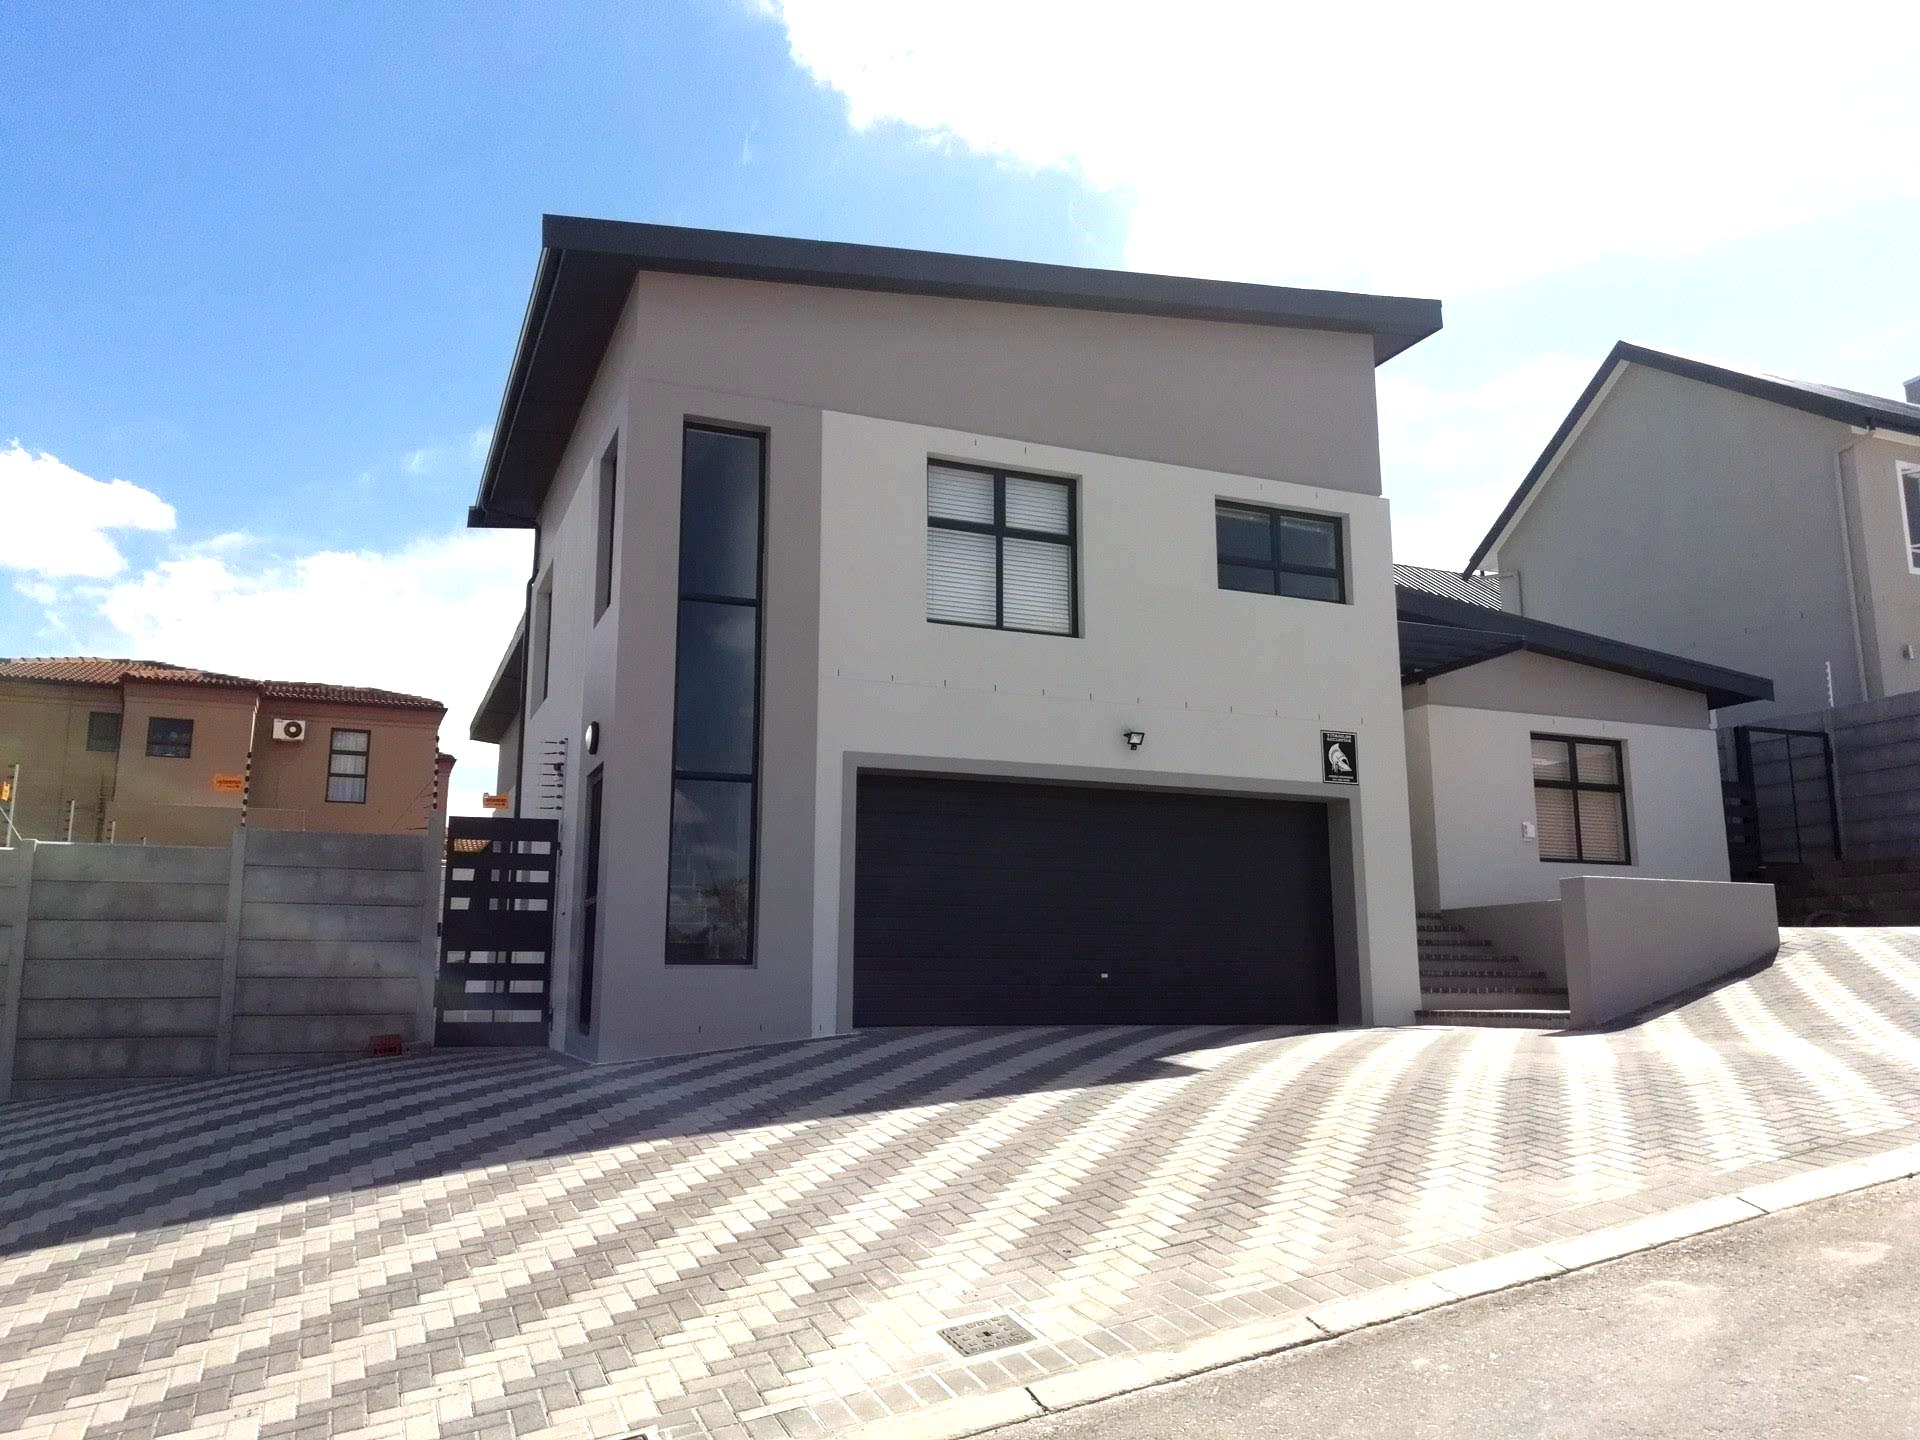 House Genis, Brackenfell, Kwali Mark Construction, Brackenfell, Western Cape